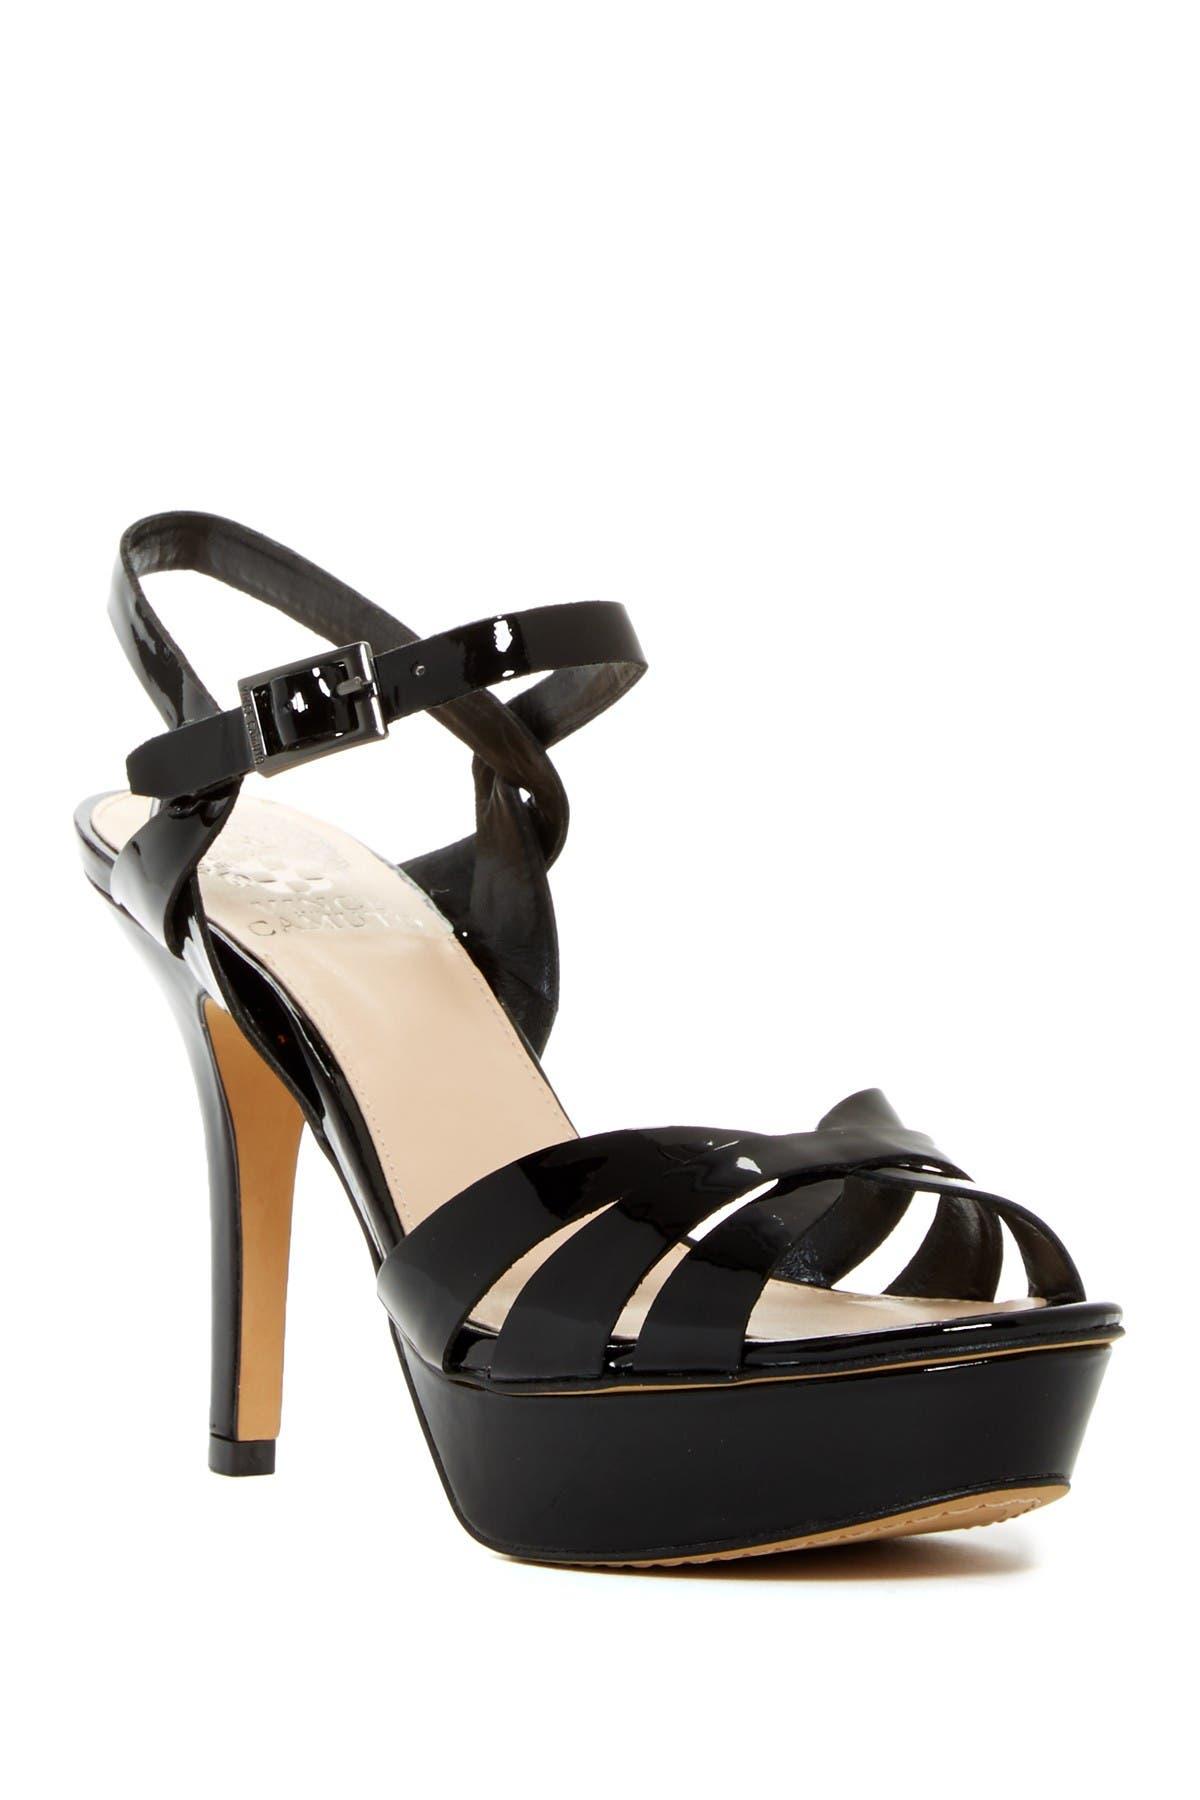 Vince Camuto | Peppa Platform Sandal